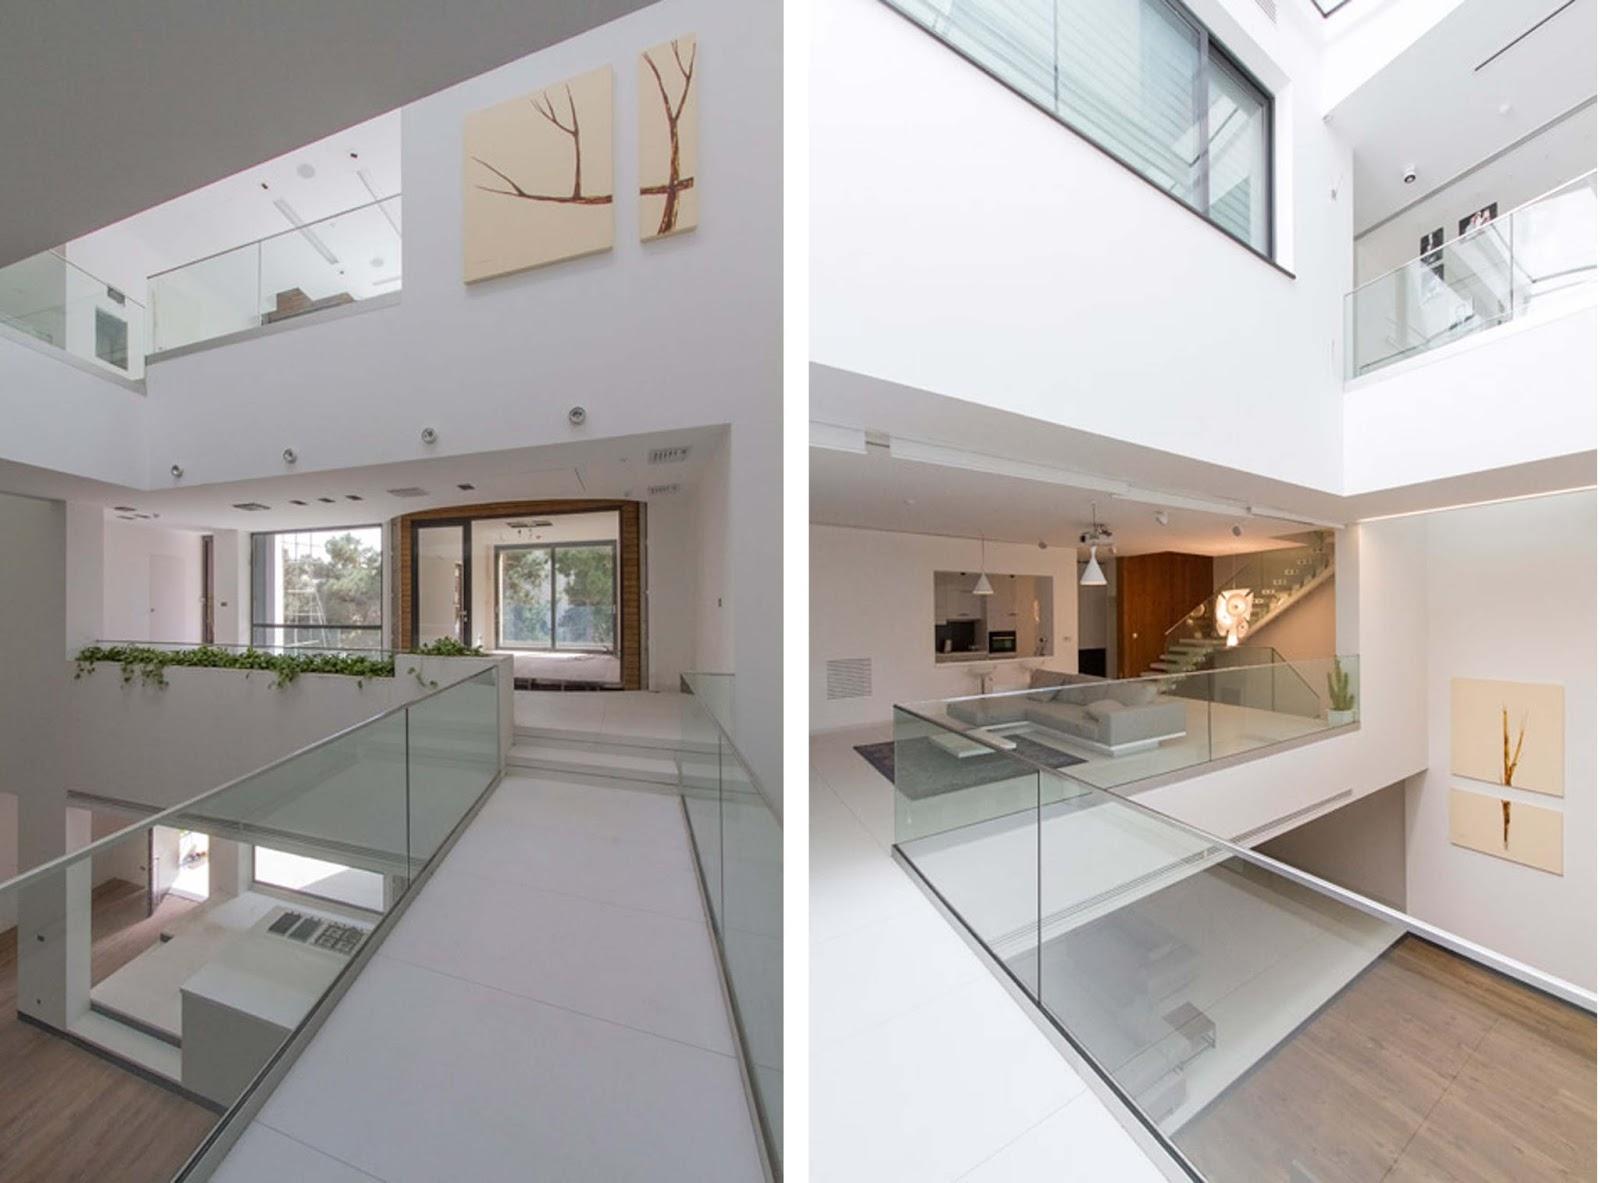 Stanze rotanti nella Sharifi-ha House by Next Office | ARC ...